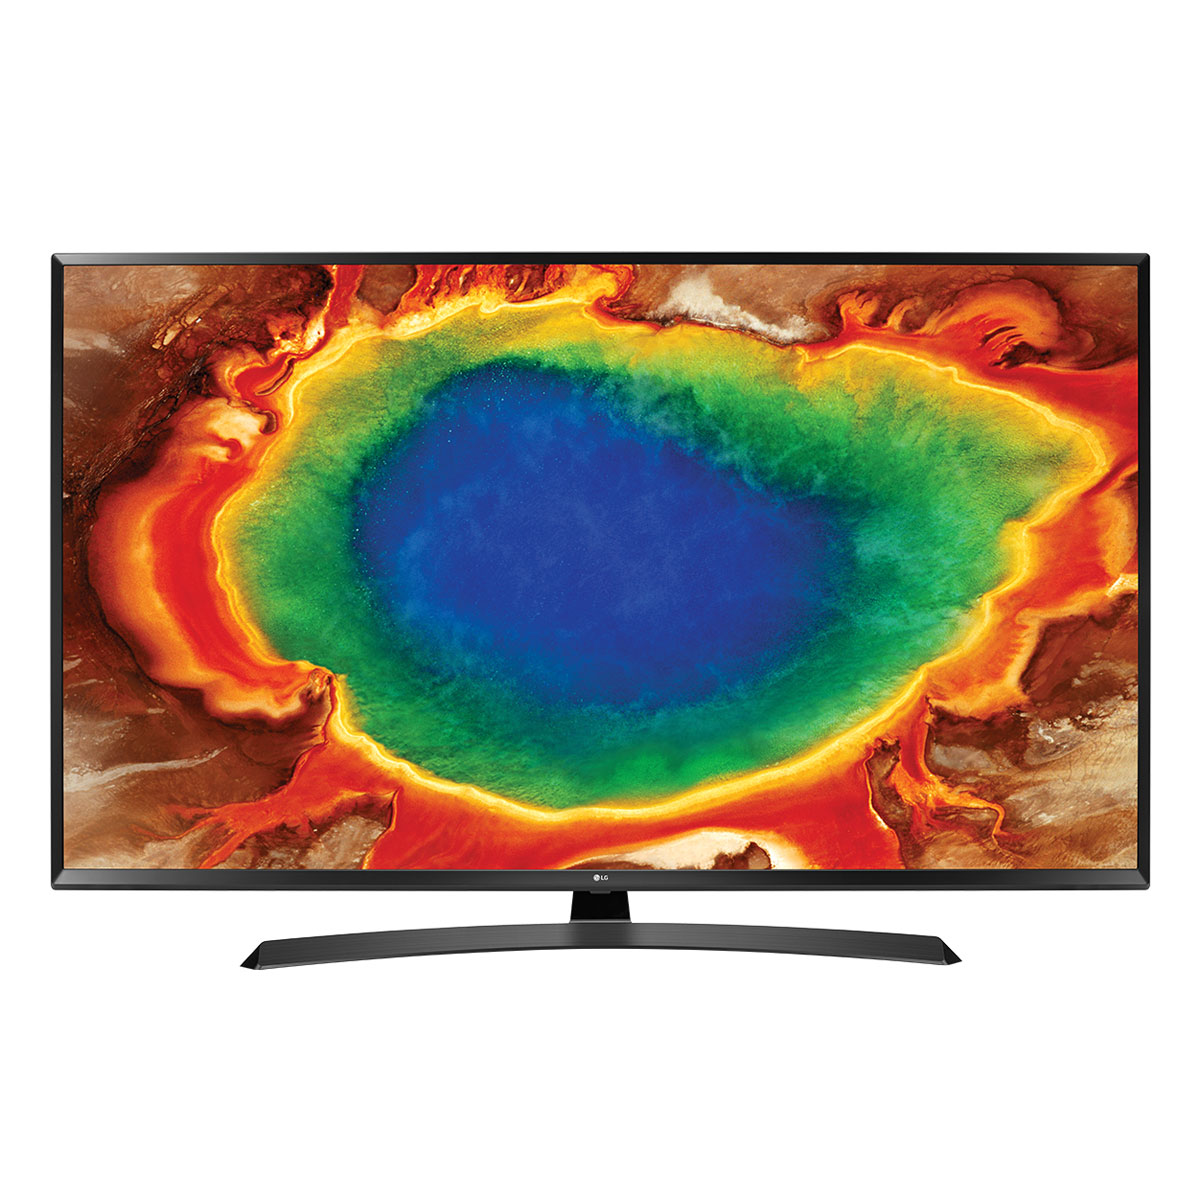 "TV LG 55UJ635V Téléviseur LED 4K 55"" (140 cm) 16/9 - 3840 x 2160 pixels - TNT, Câble et Satellite HD - Ultra HD 2160p - HDR - 1600 Hz - Wi-Fi - Bluetooth - DLNA"